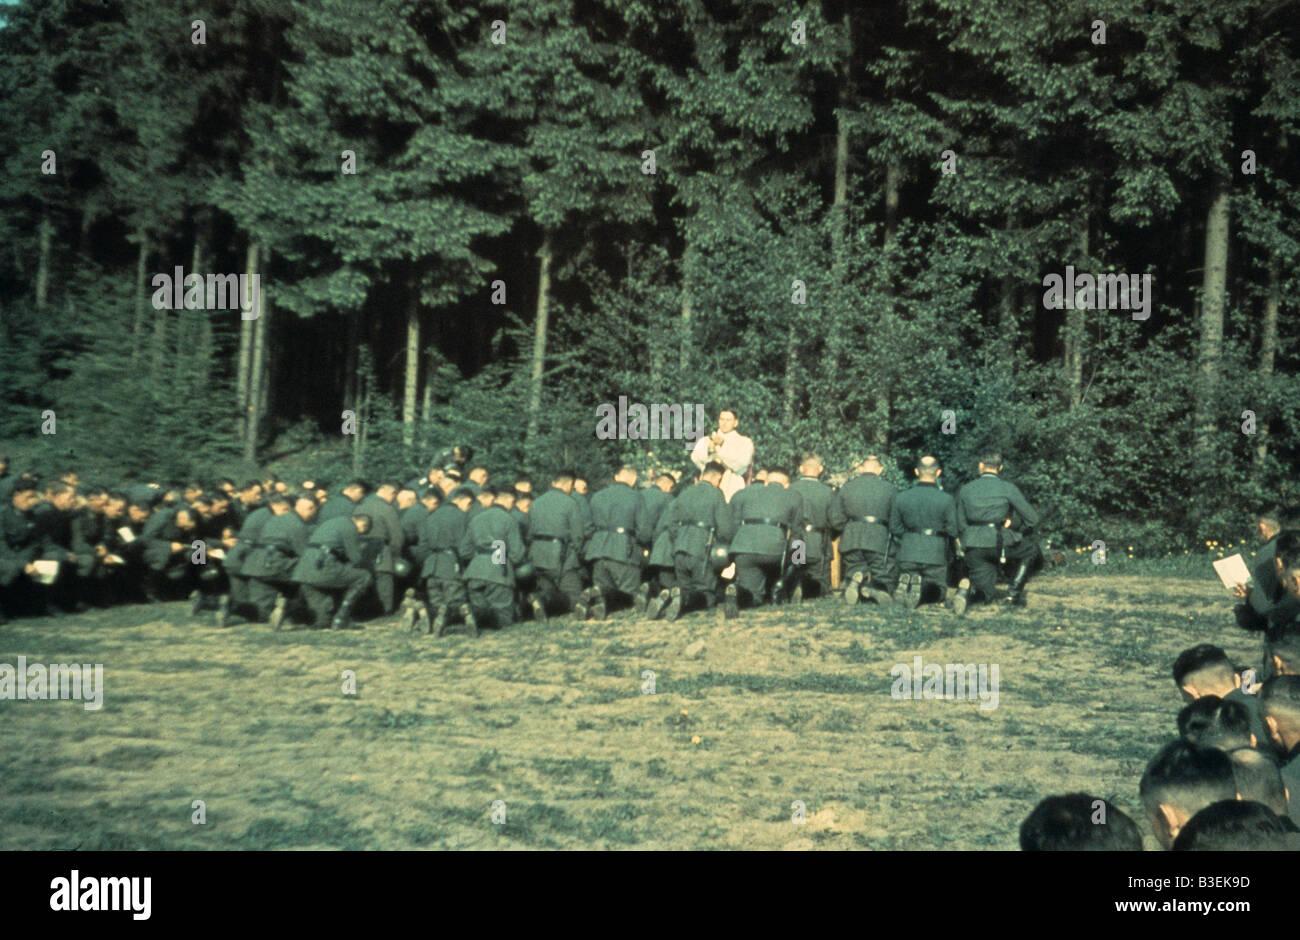 World War II/Russian Campaign/1941. - Stock Image